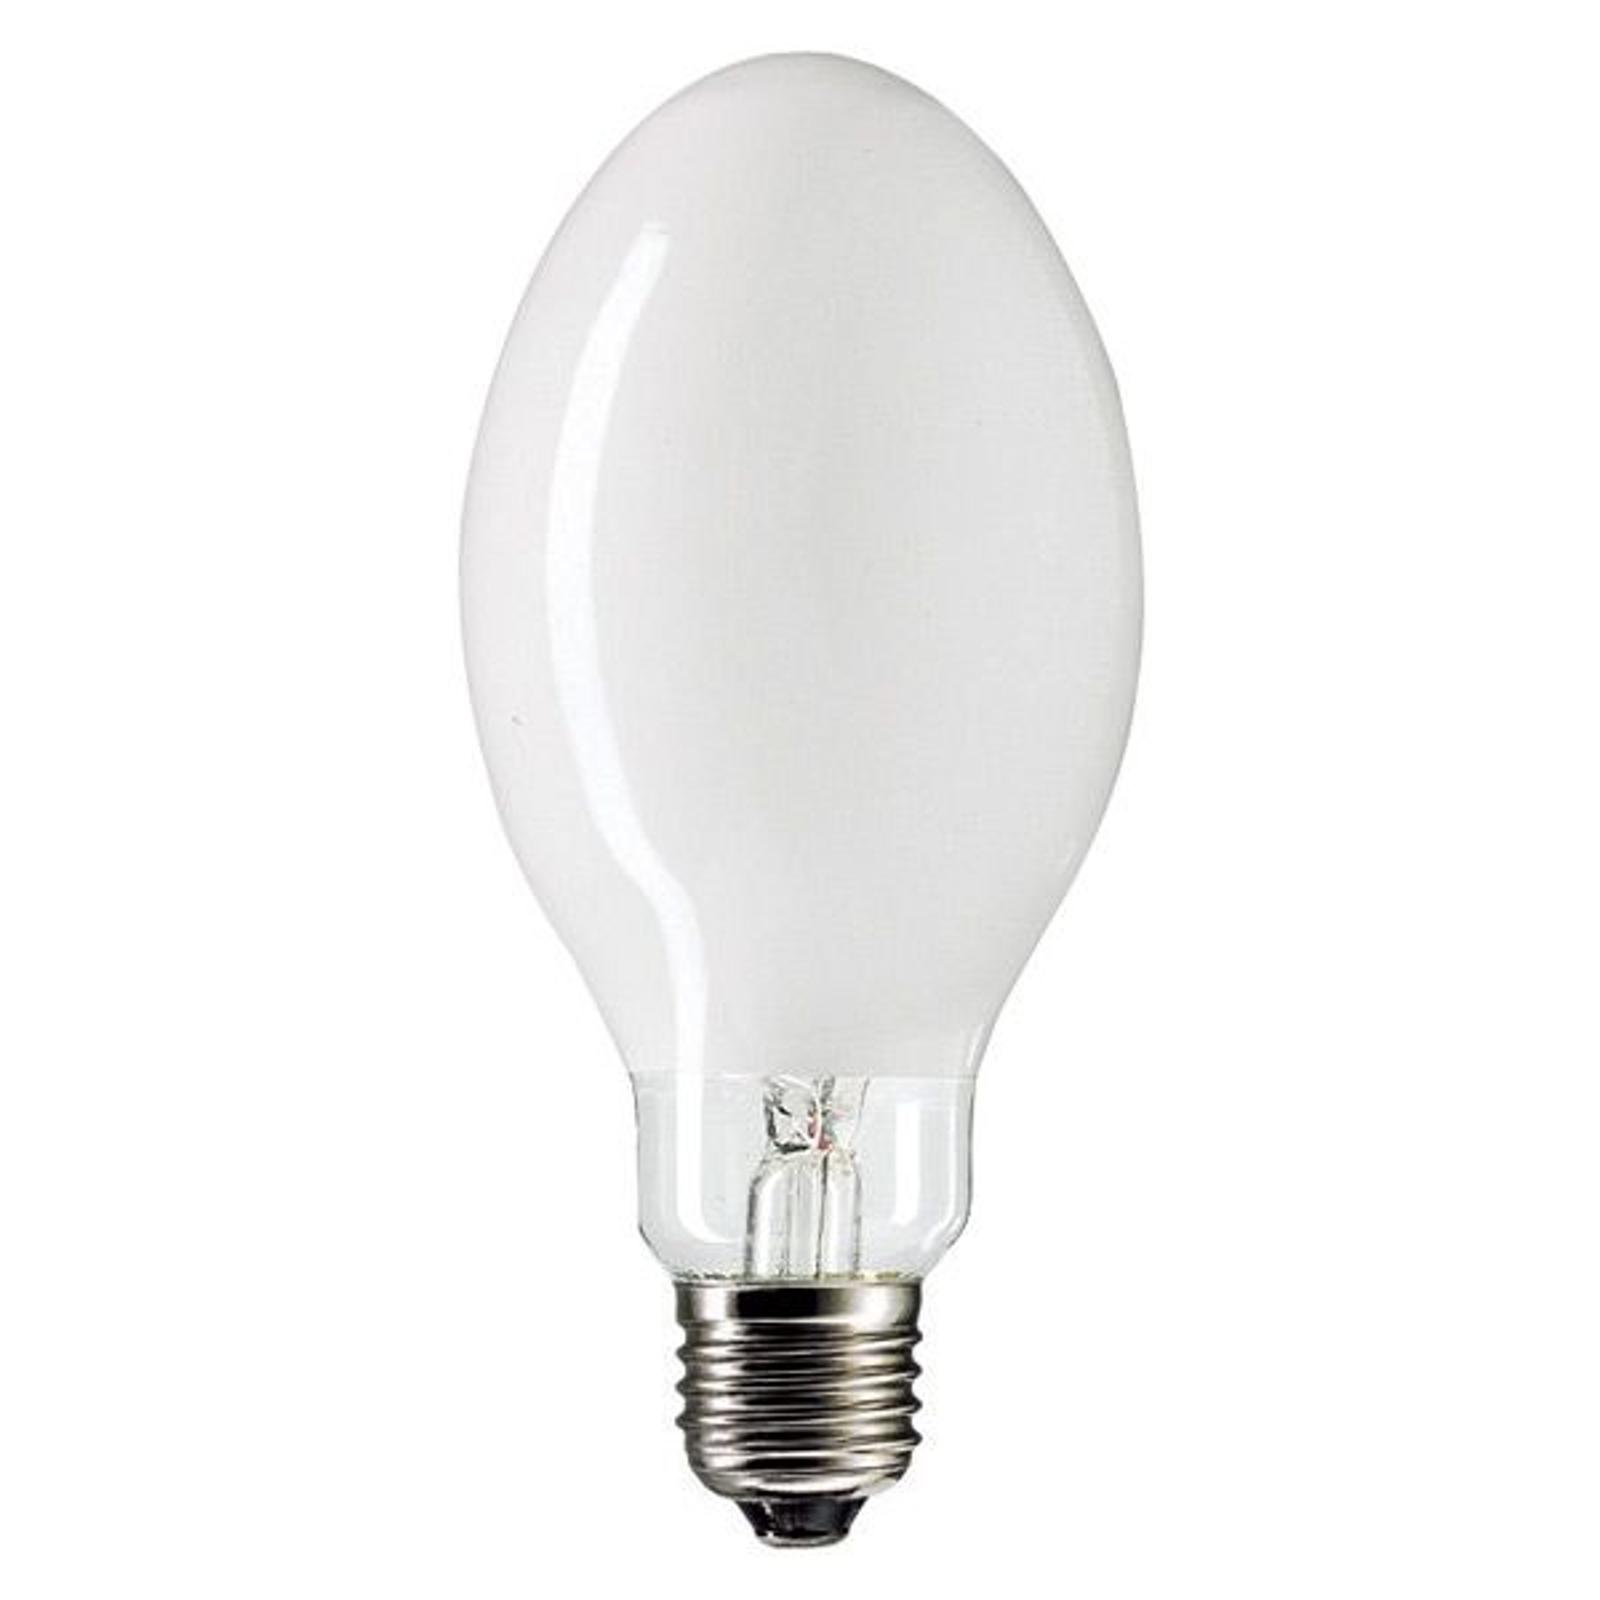 E40 100W 828 Metallhalogenlampa Master CDO-ET